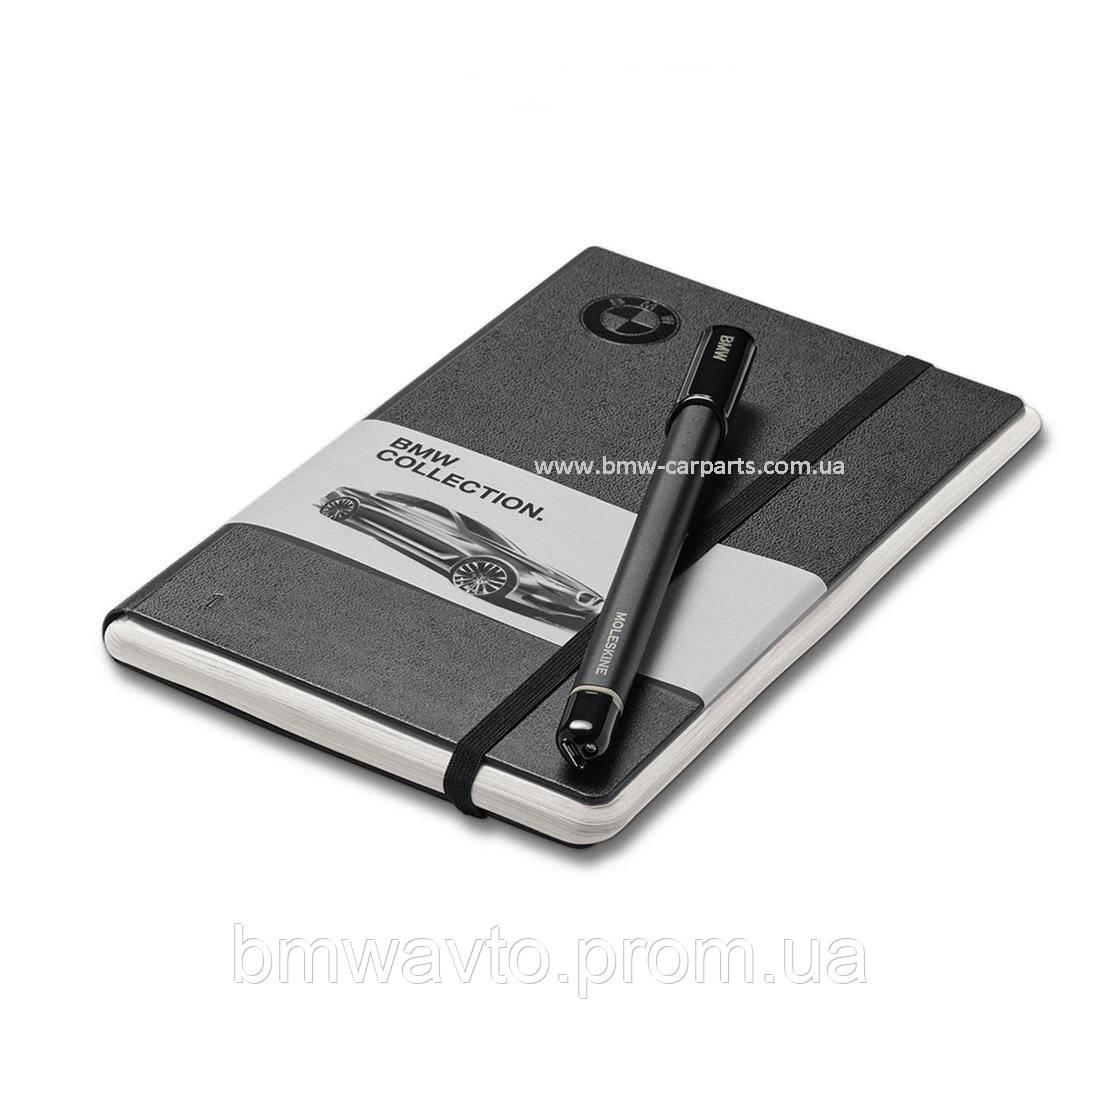 Набор блокнот и цифровая ручка BMW Smart Writing Set by Moleskine 2017